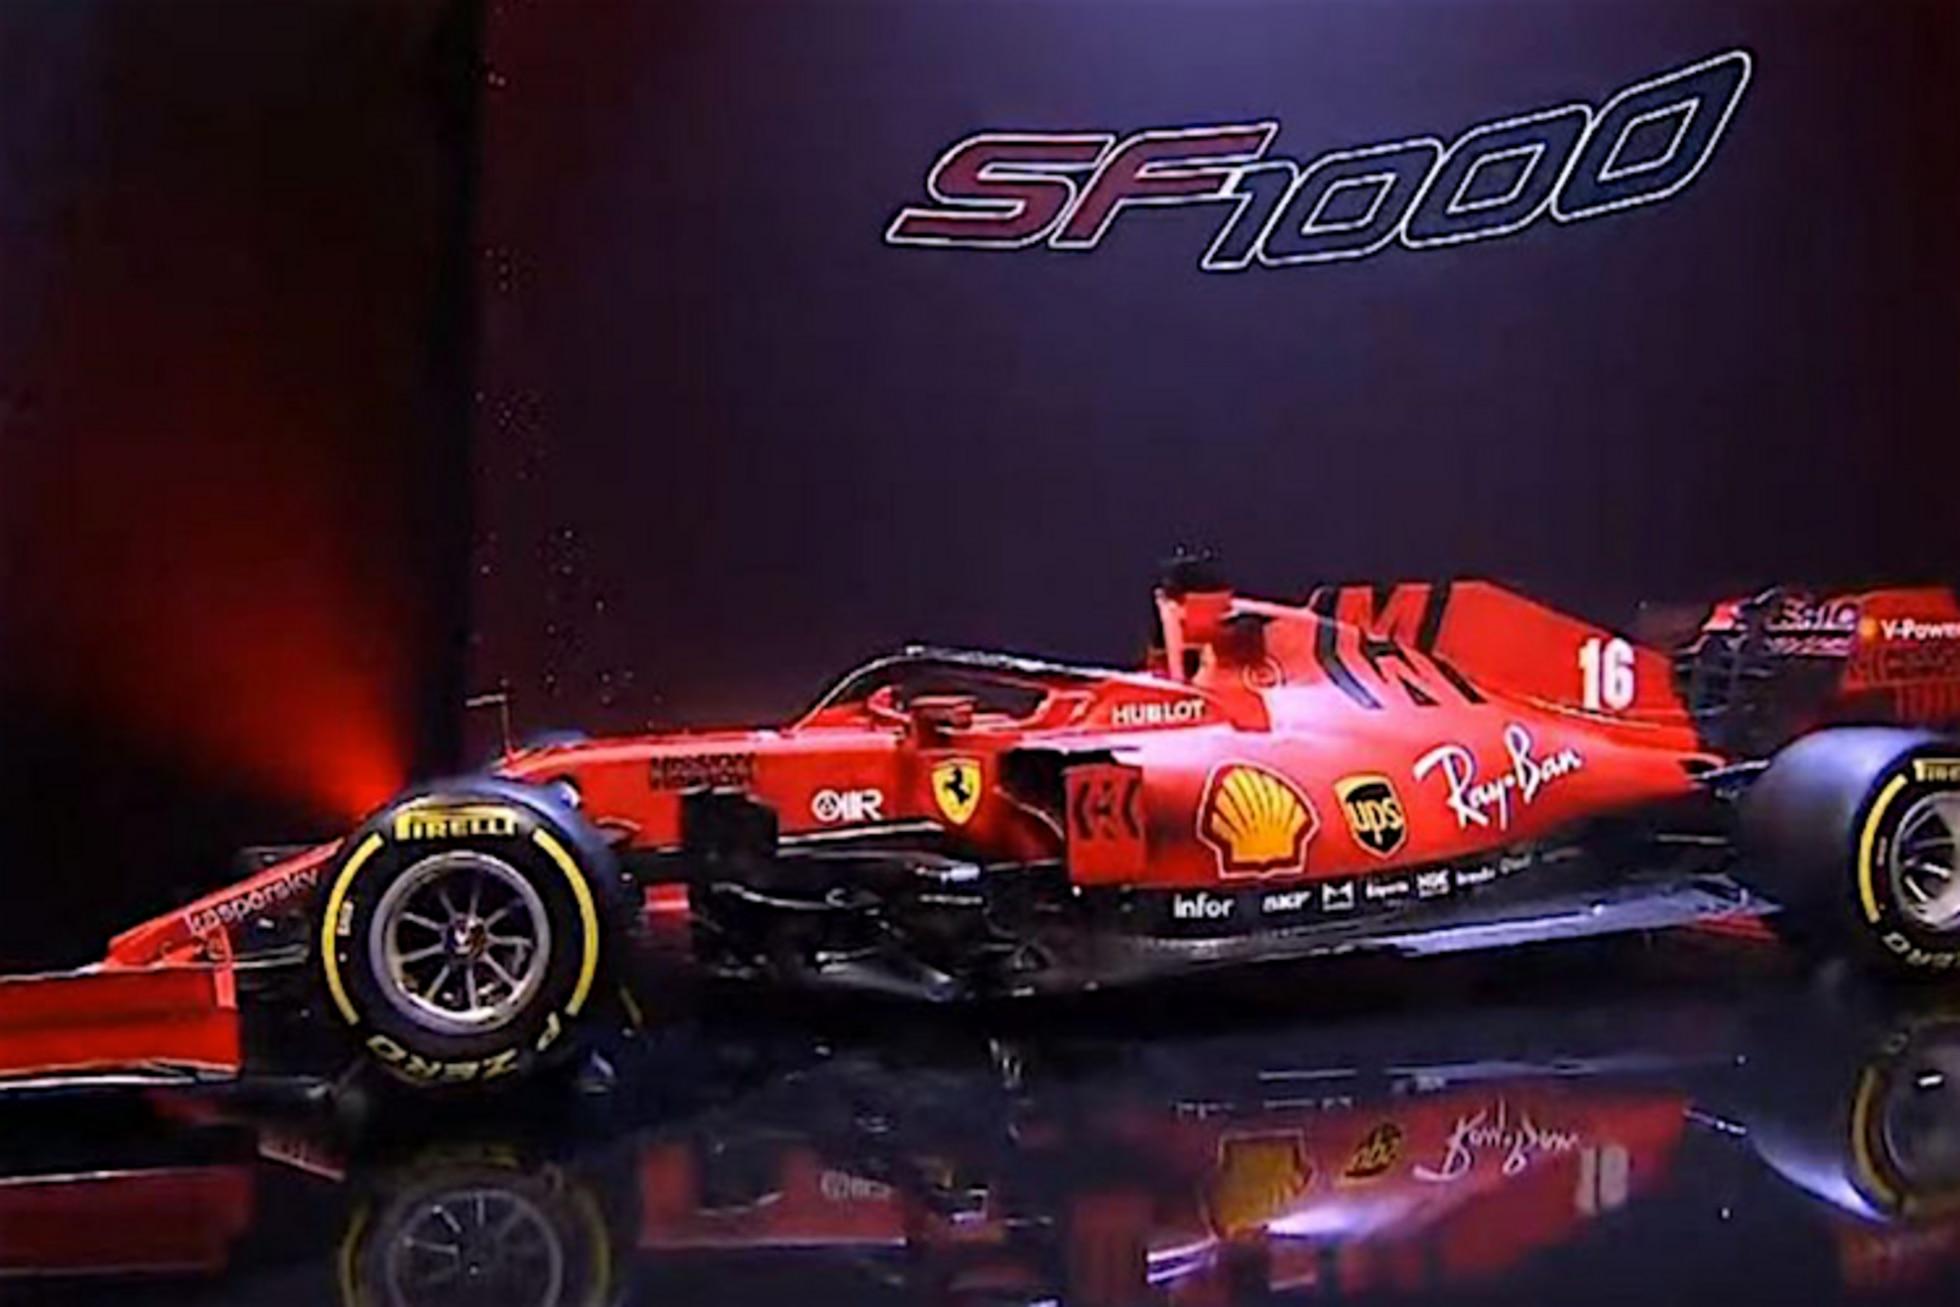 Ferrari Sf1000 Von Sebastian Vettel Erste Bilder Formel 1 Speedweek Com